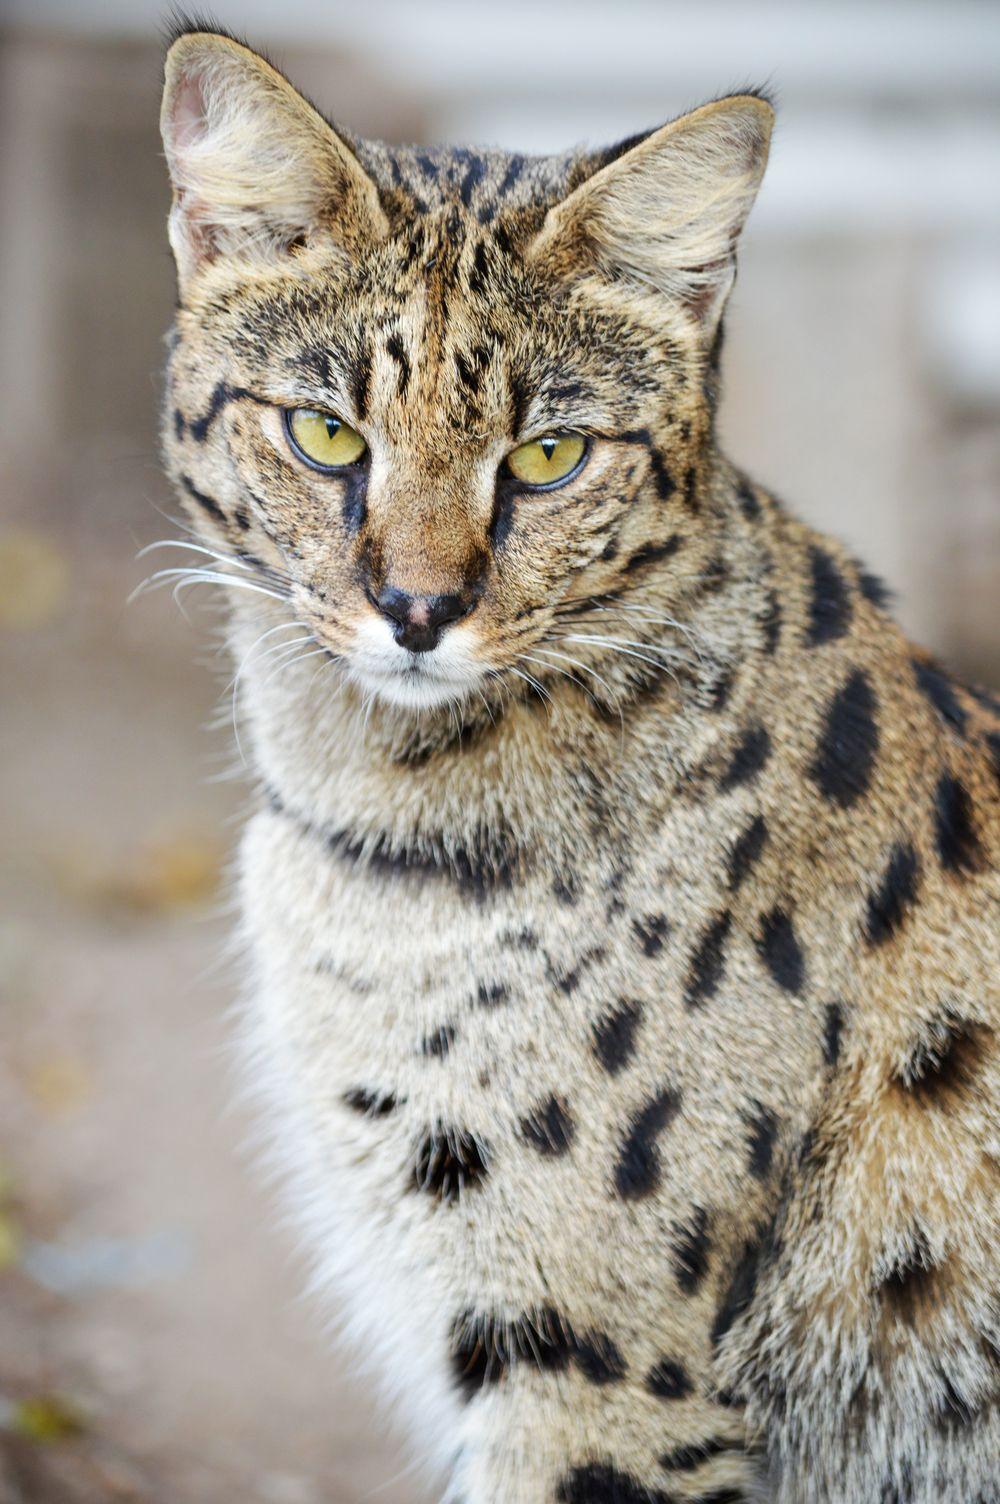 A1 Savannahs The Original Founder of The Savannah Cat